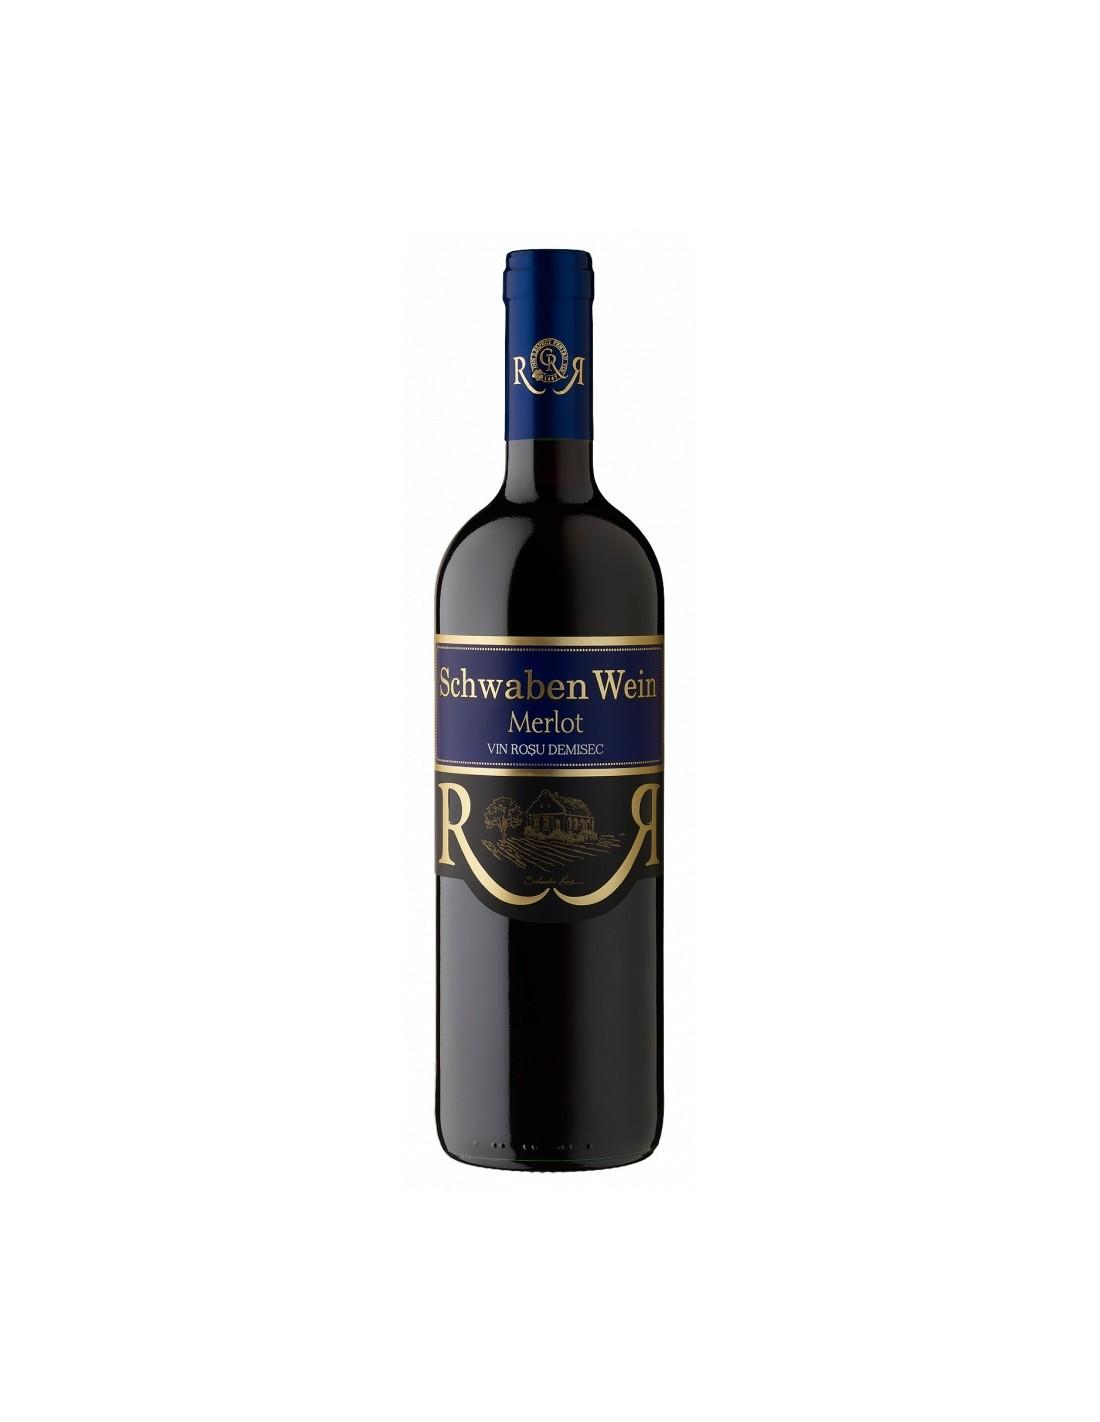 Vin rosu demisec, Merlot, Schwaben Wein Recas, 0.75L, 13.5% alc., Romania